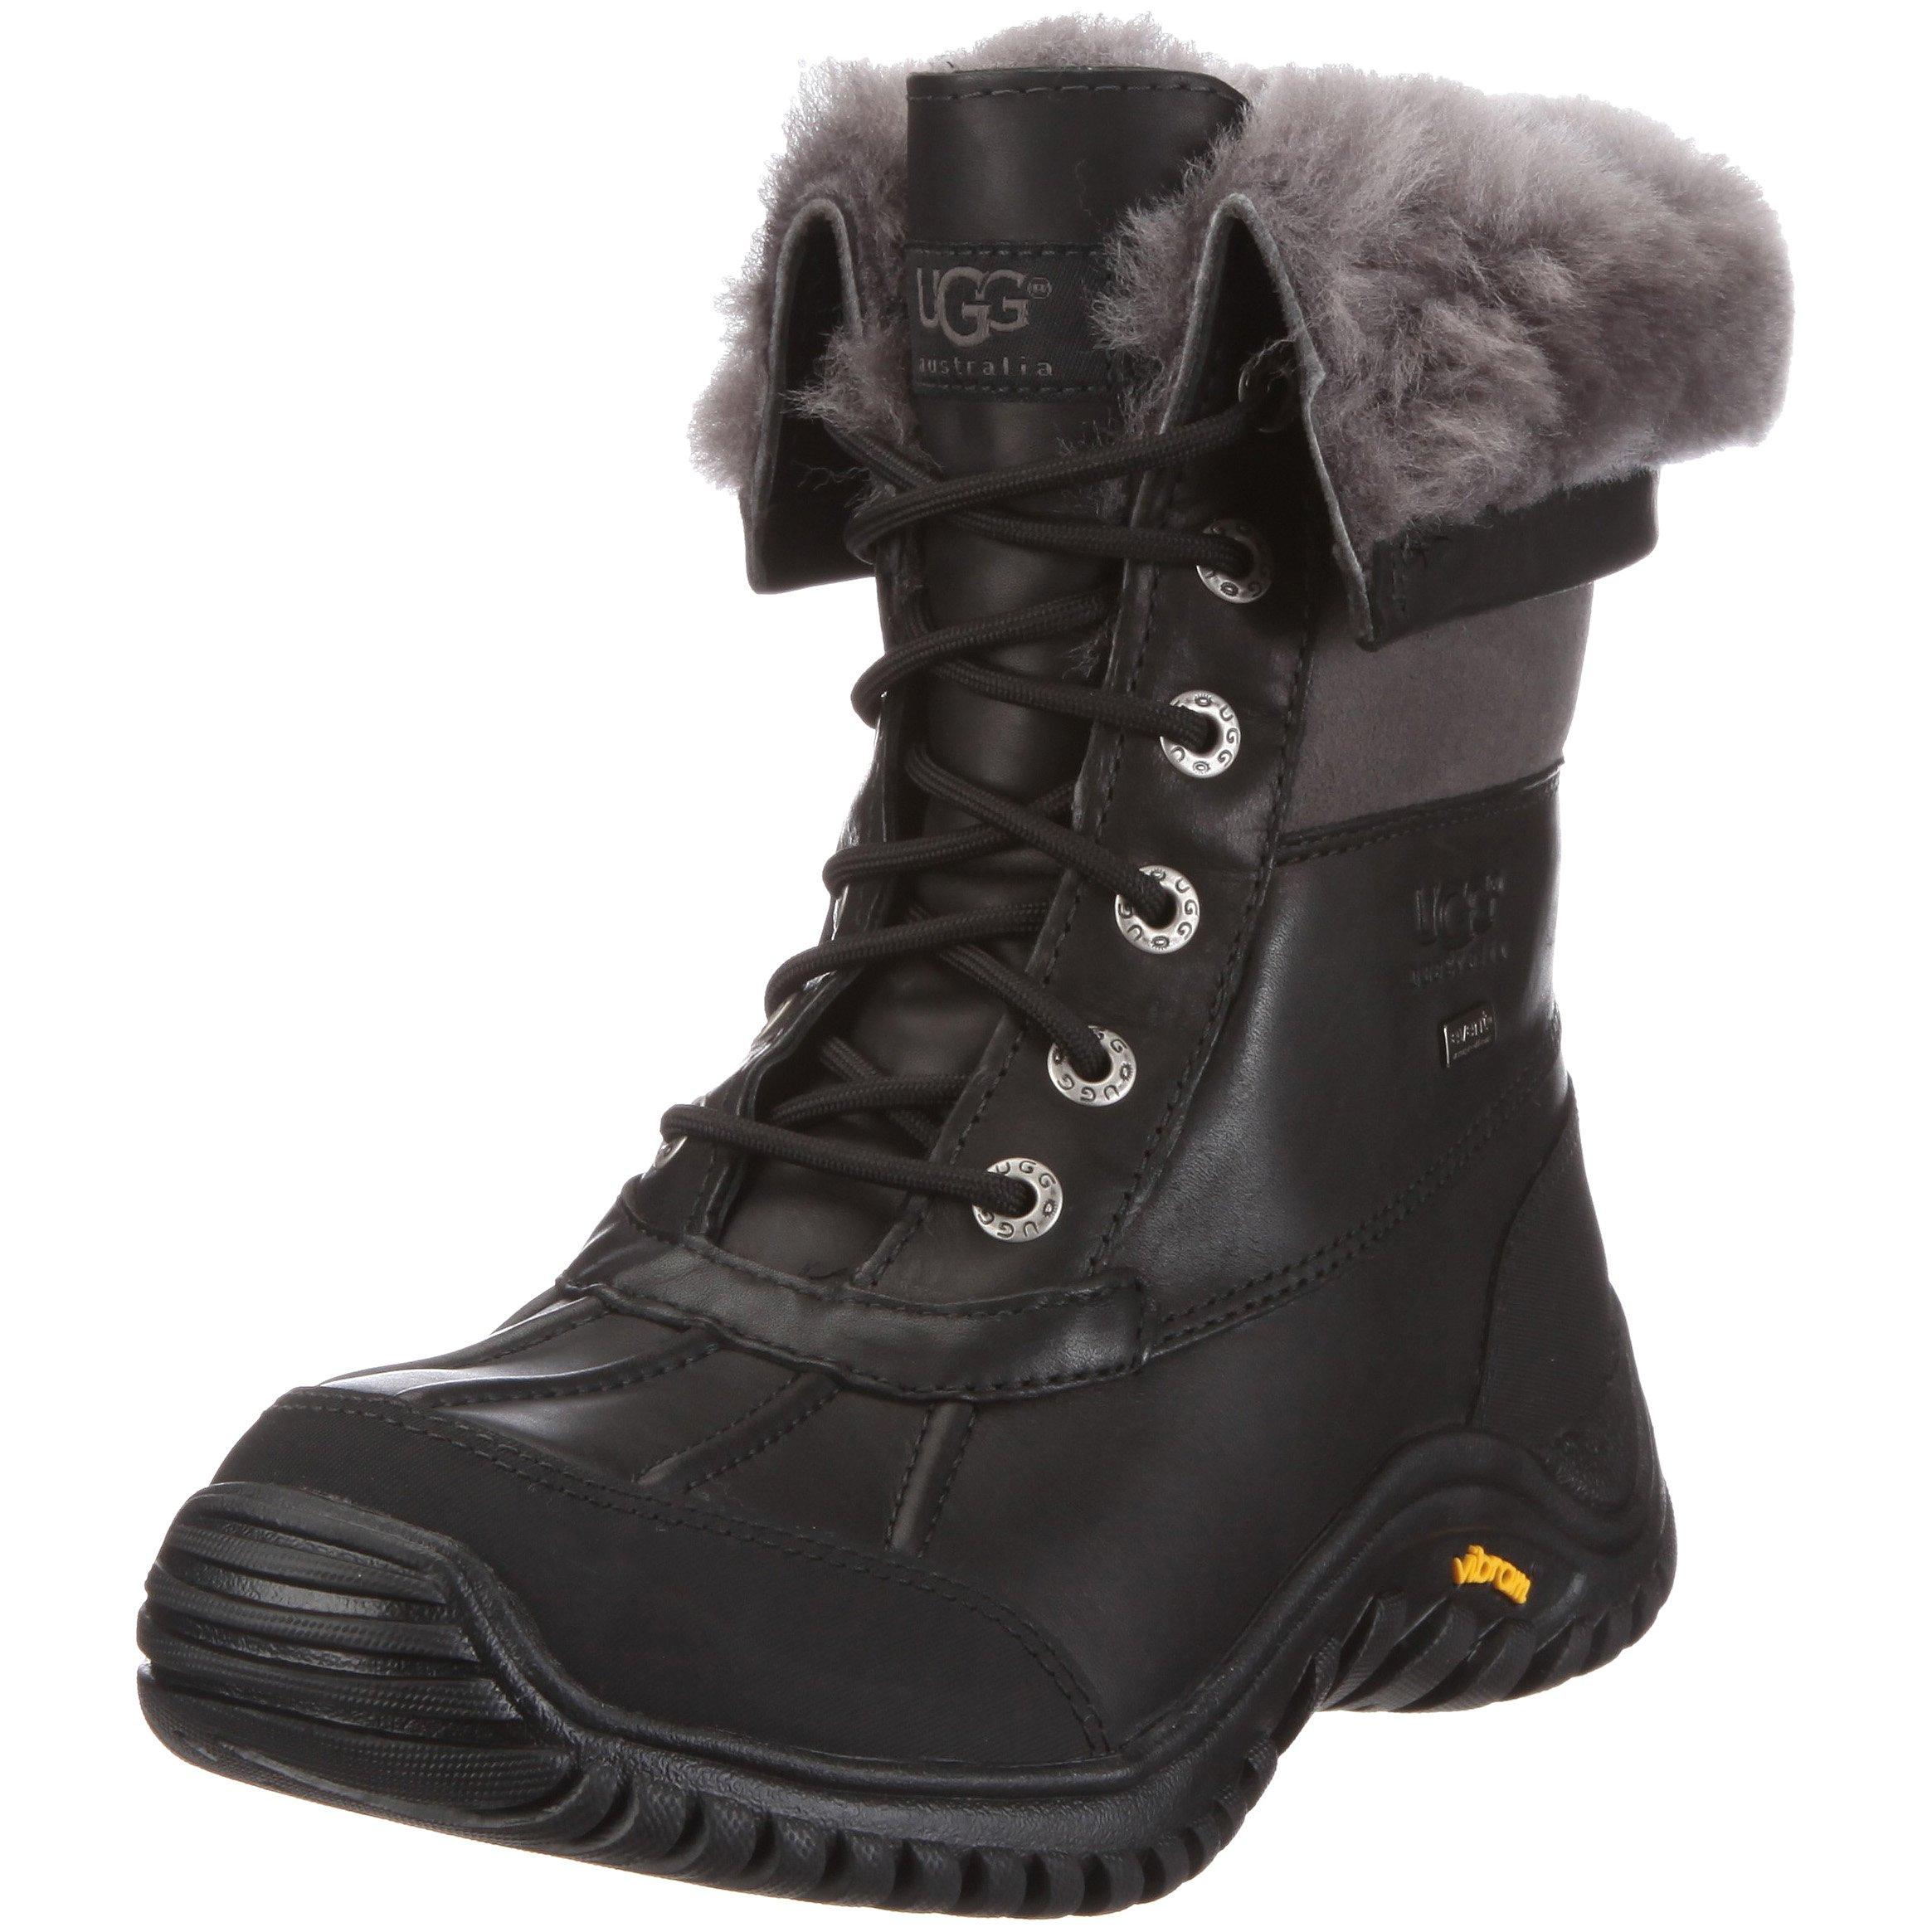 UGG Women's Adirondack II Winter Boot, Black/Grey, 9 B US